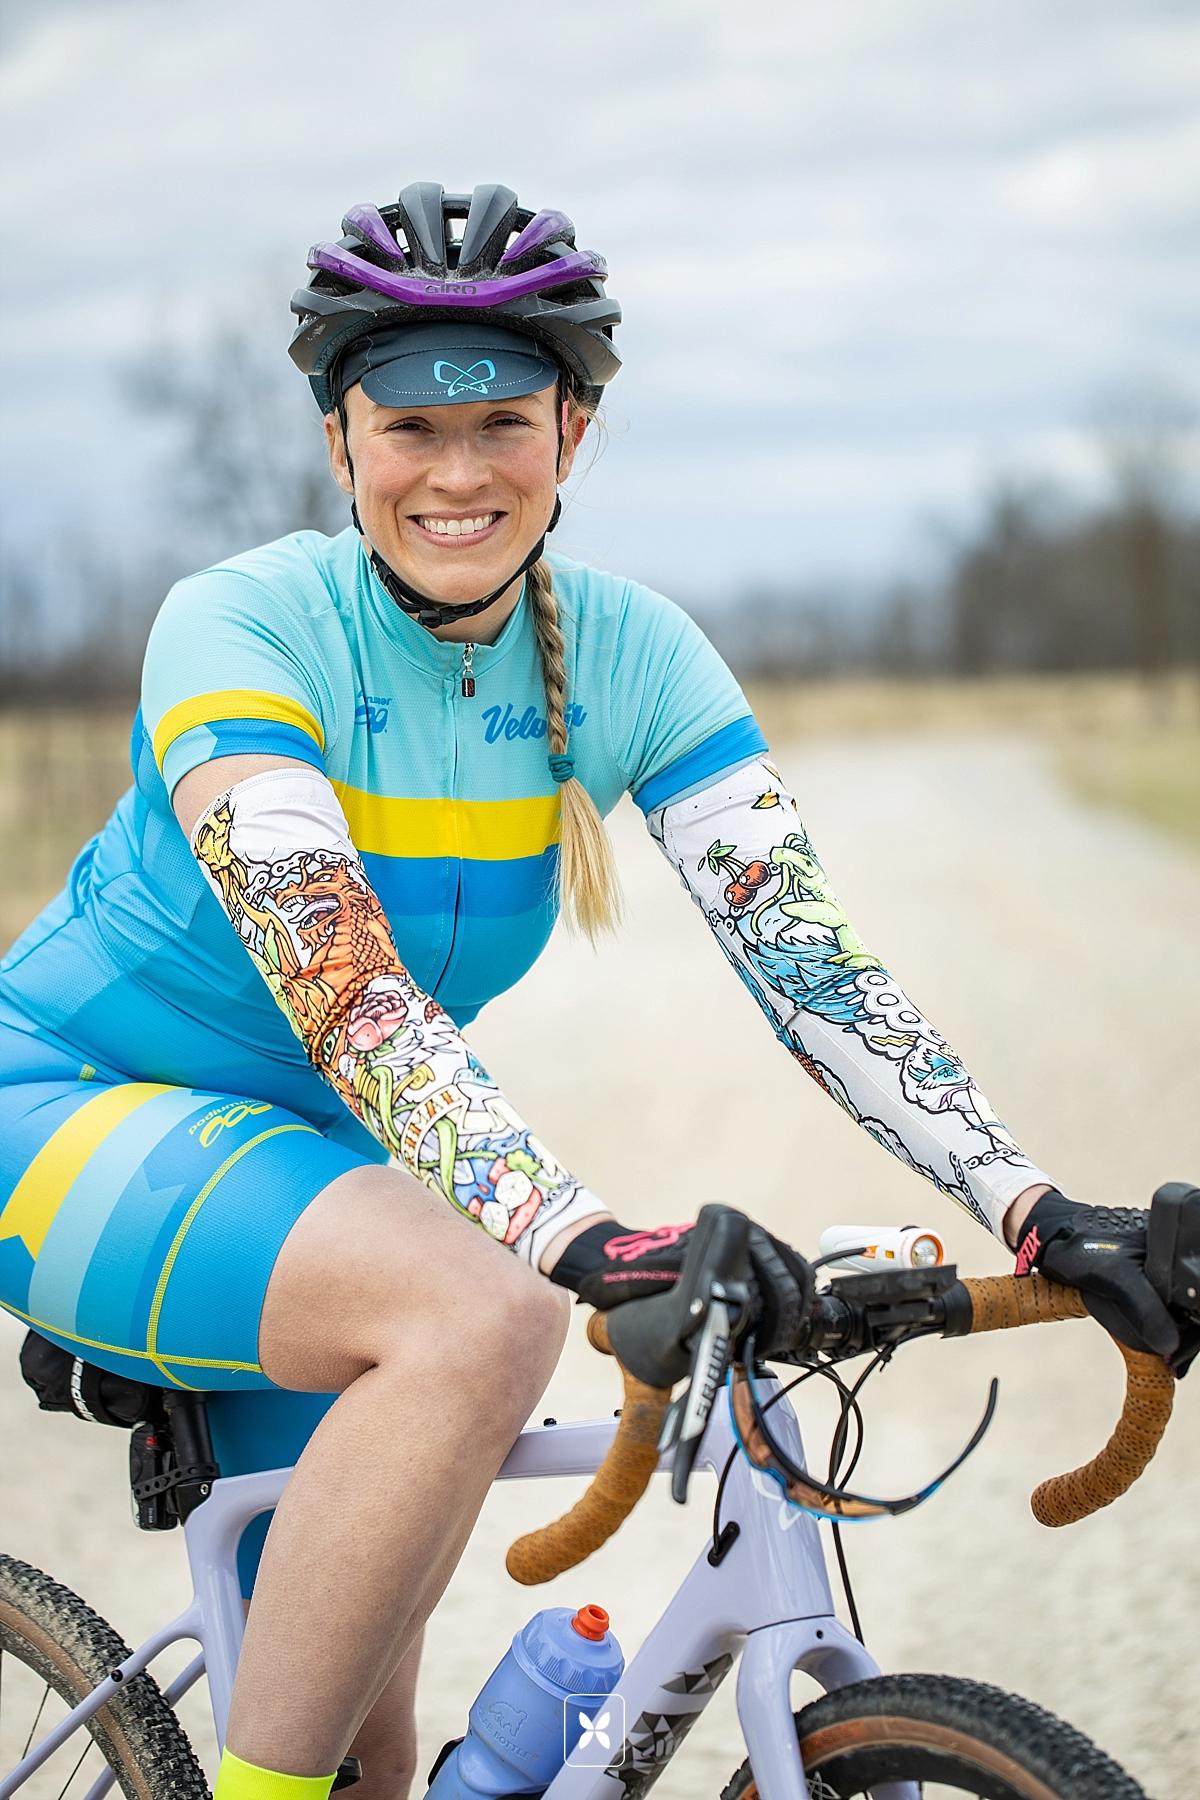 novo studio - bike arkansas magazine - bentonville mountain biking photography_0025.jpg